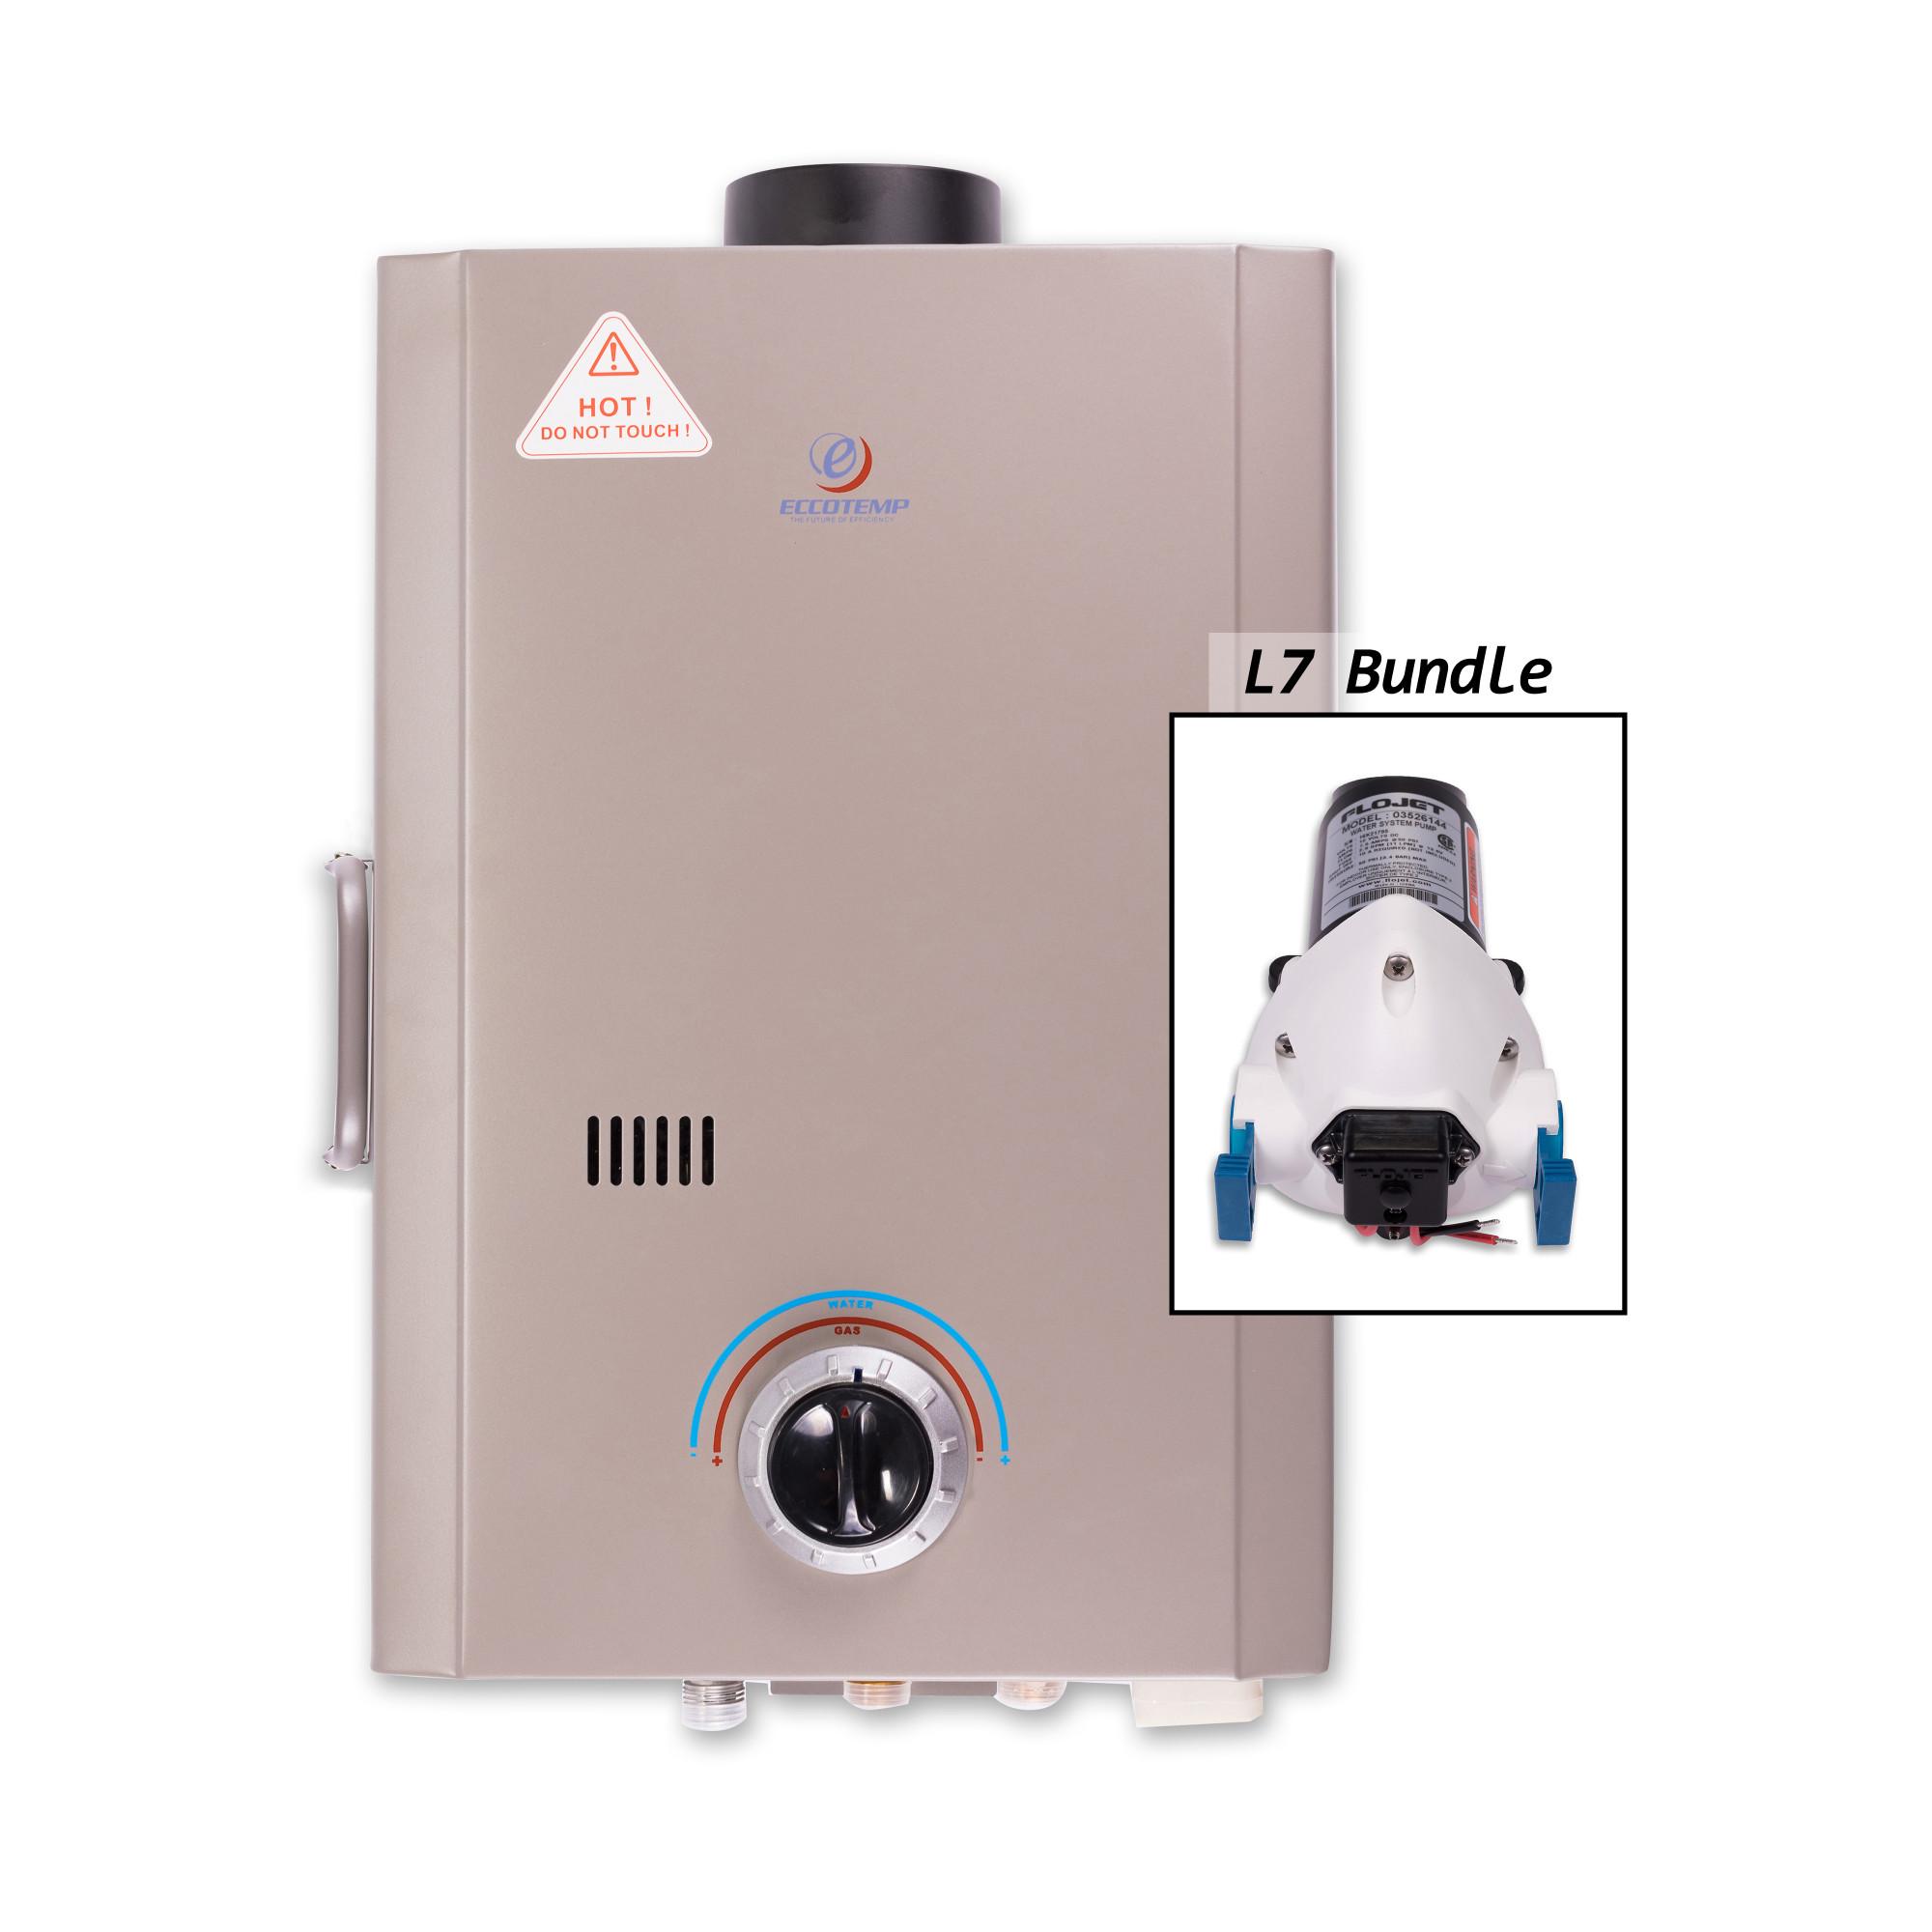 Eccotemp L7-P 1.7 Gallon Point-of-Use Liquid Propane Tankless Water Heater with 41,000 Maximum BTU Input and Flojet Pump